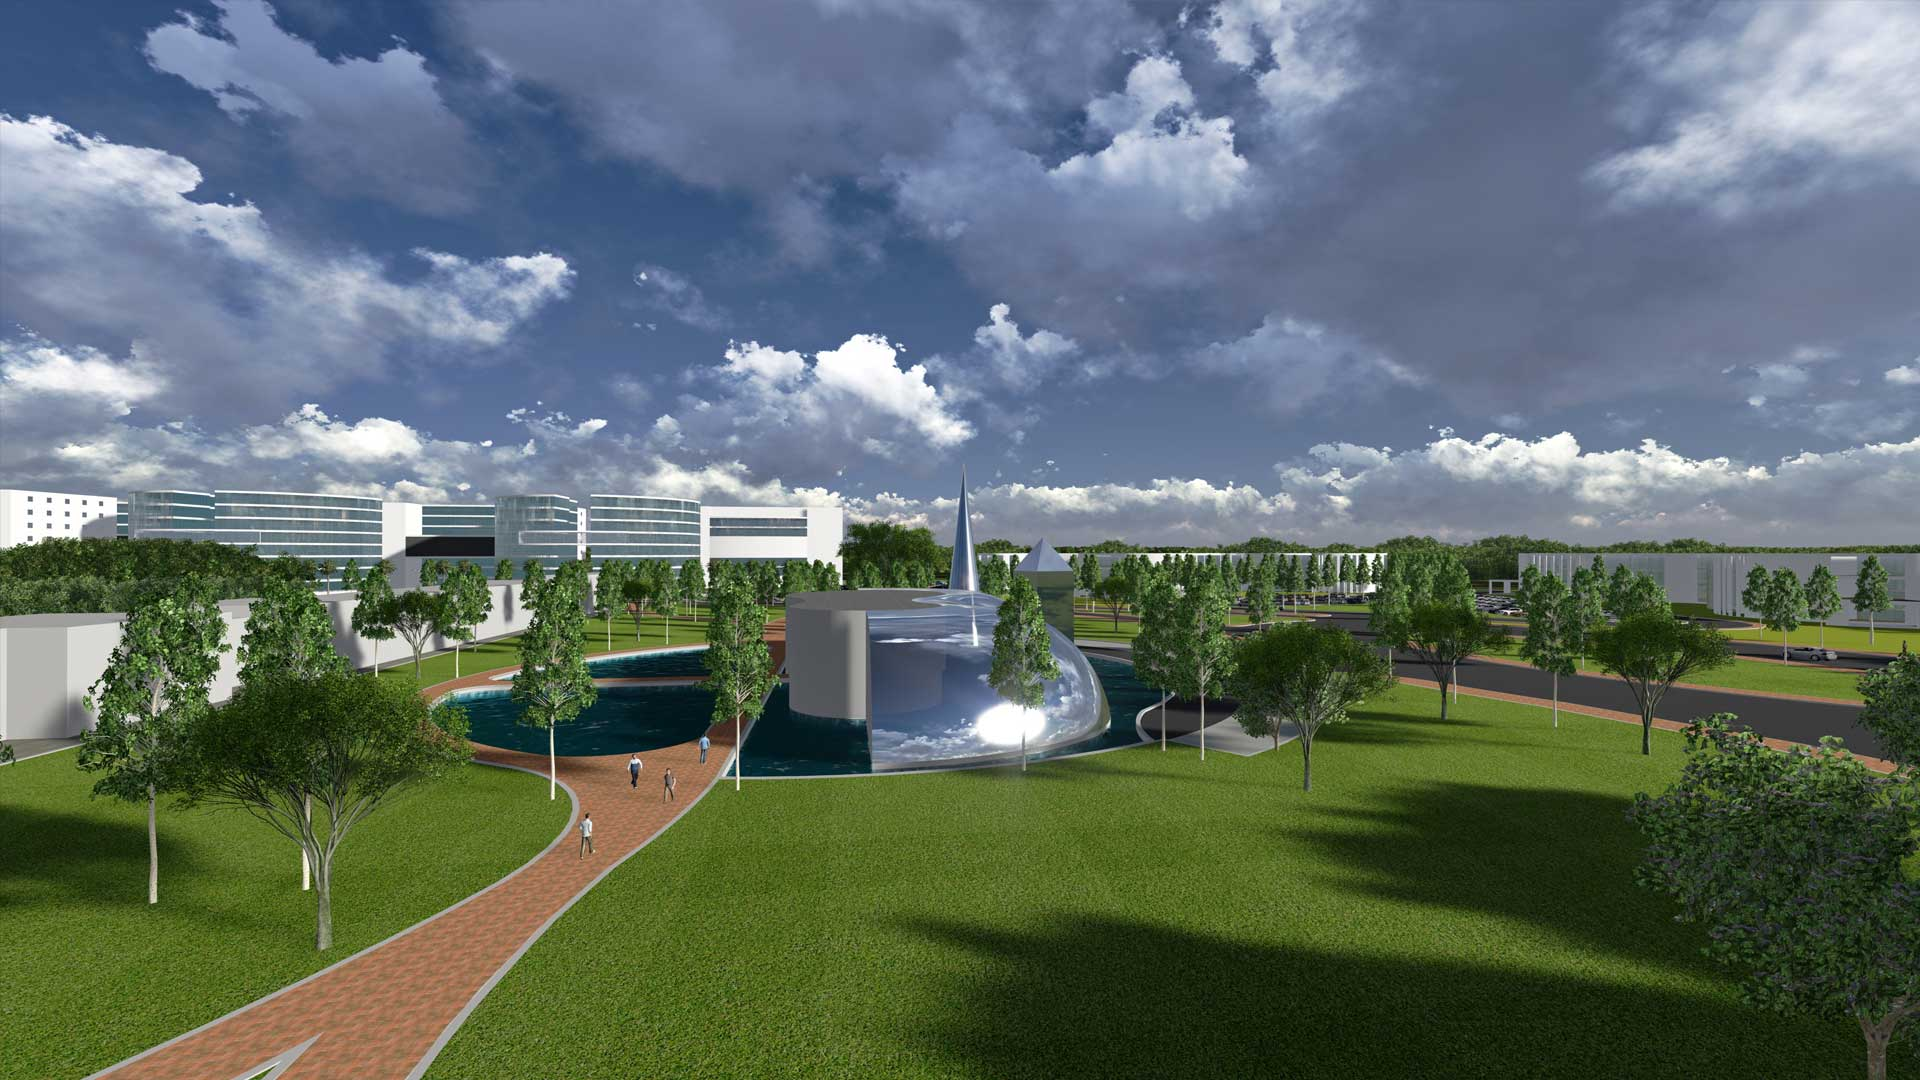 KSIDC Life Science park Thiruvananthapuram